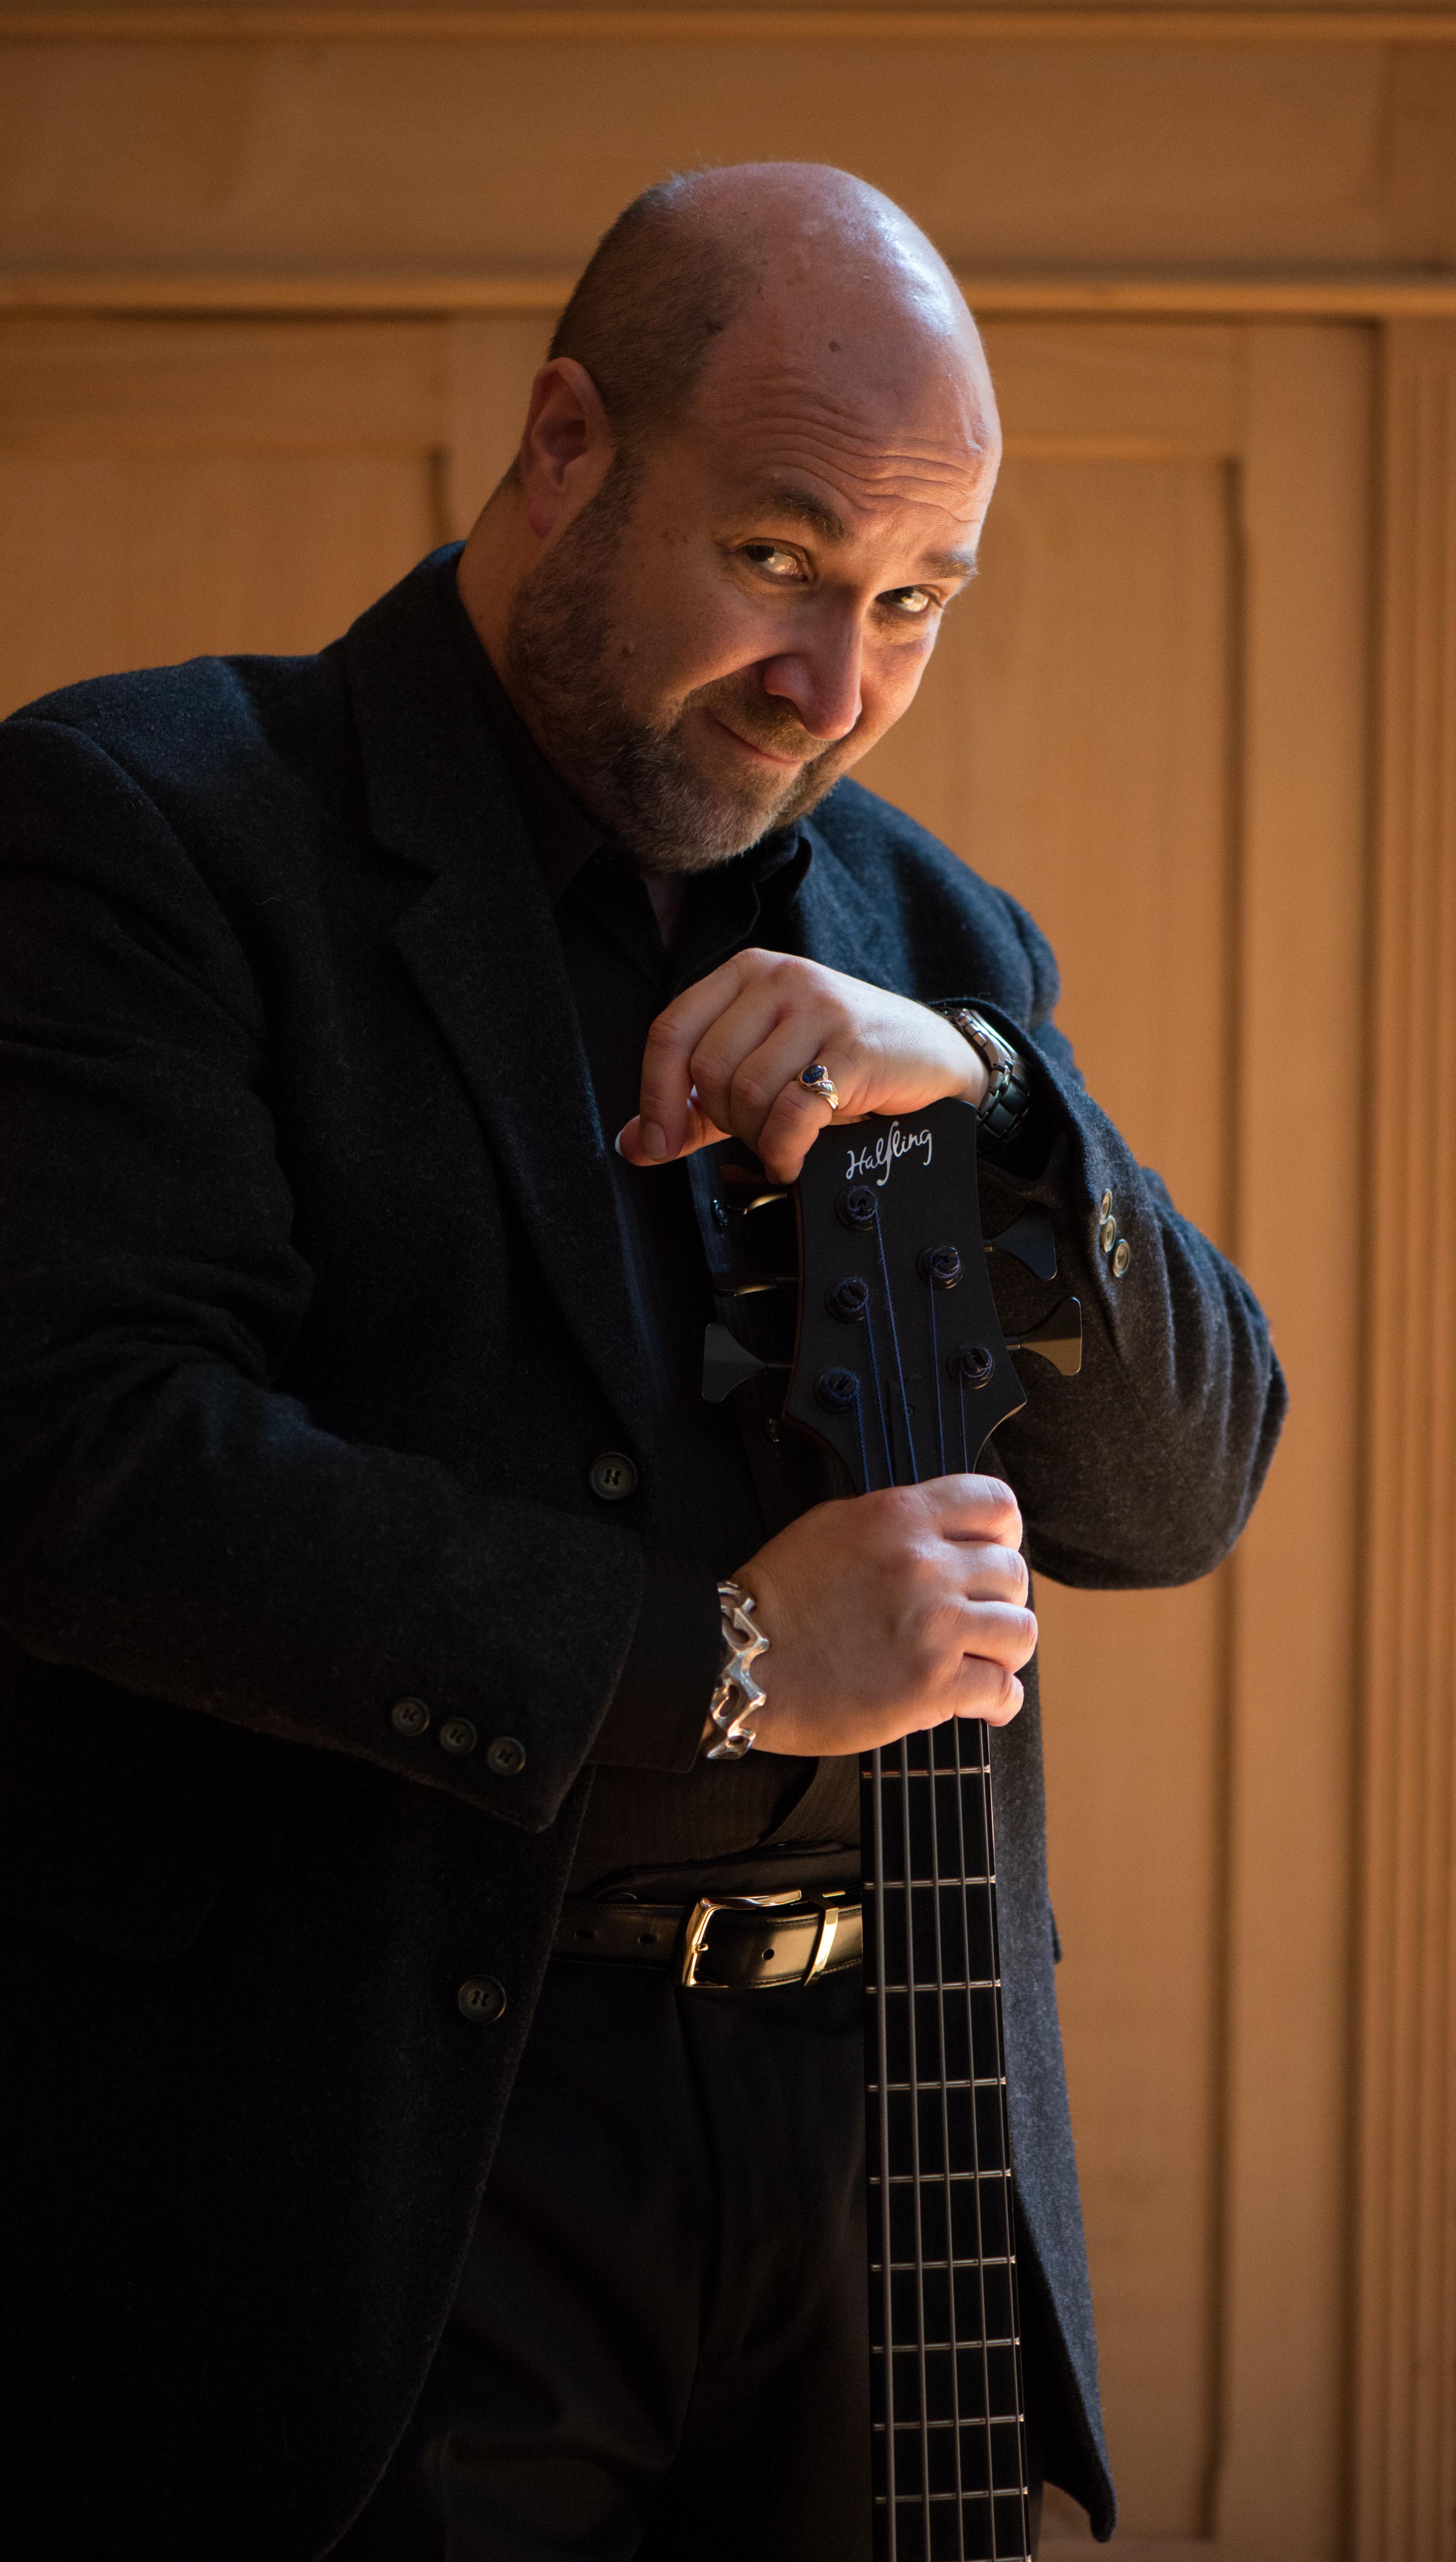 Joel-Landsberg-Aug-2014